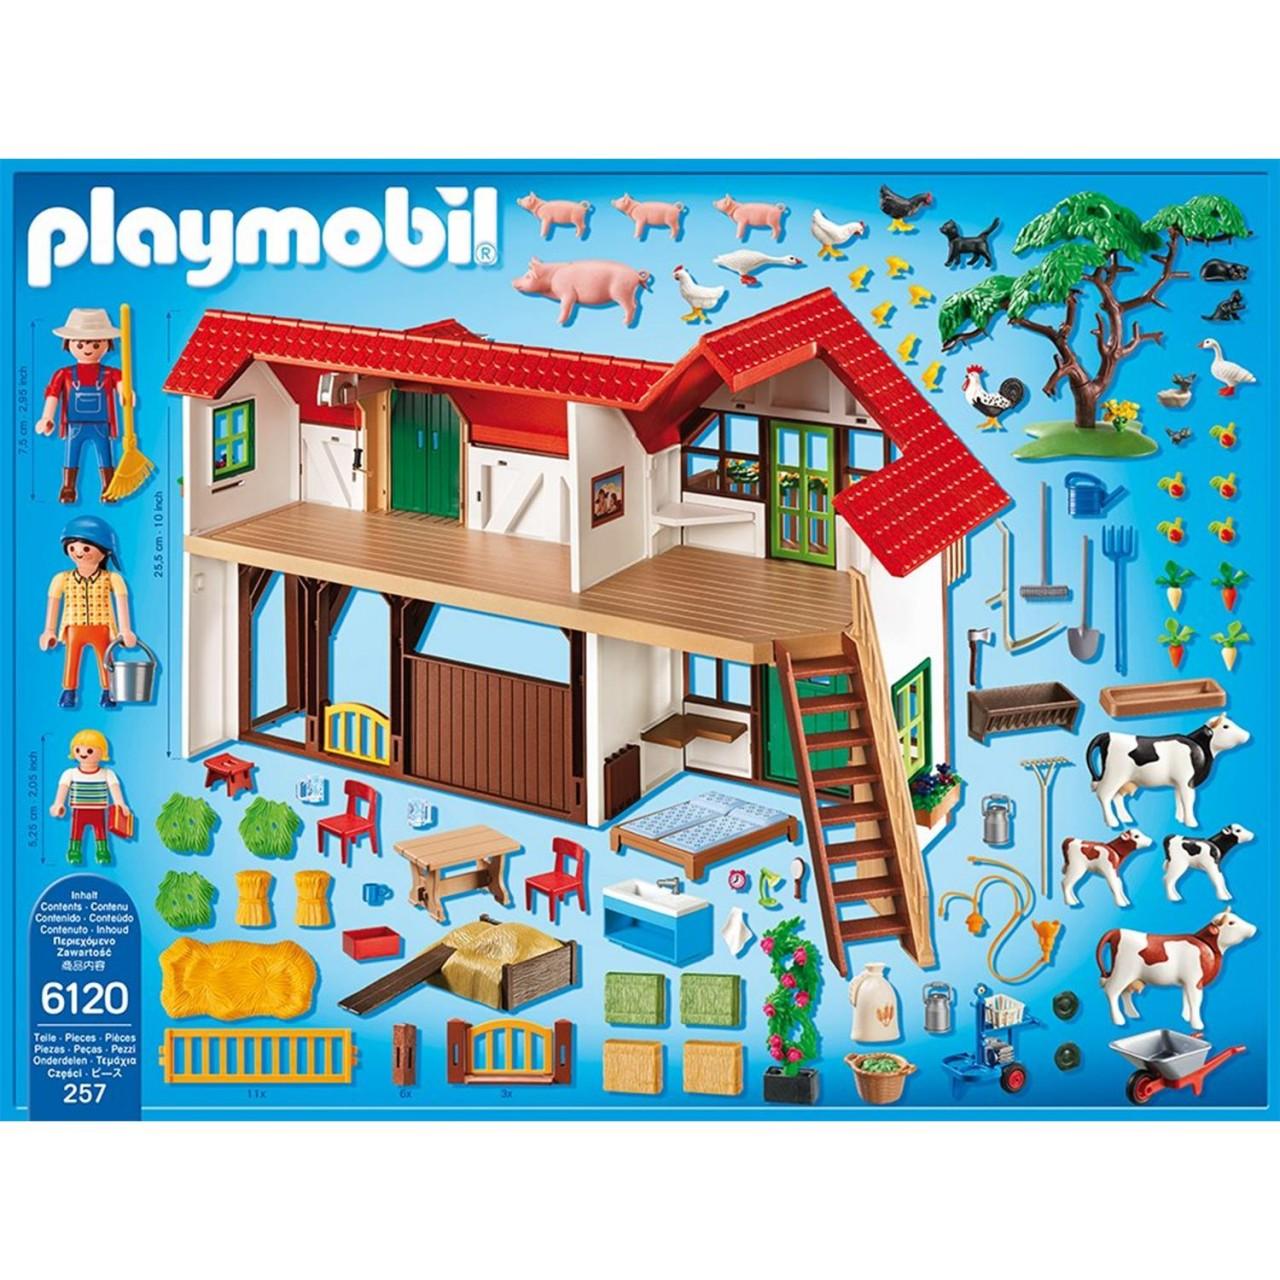 Playmobil 6120 Großer Bauernhof